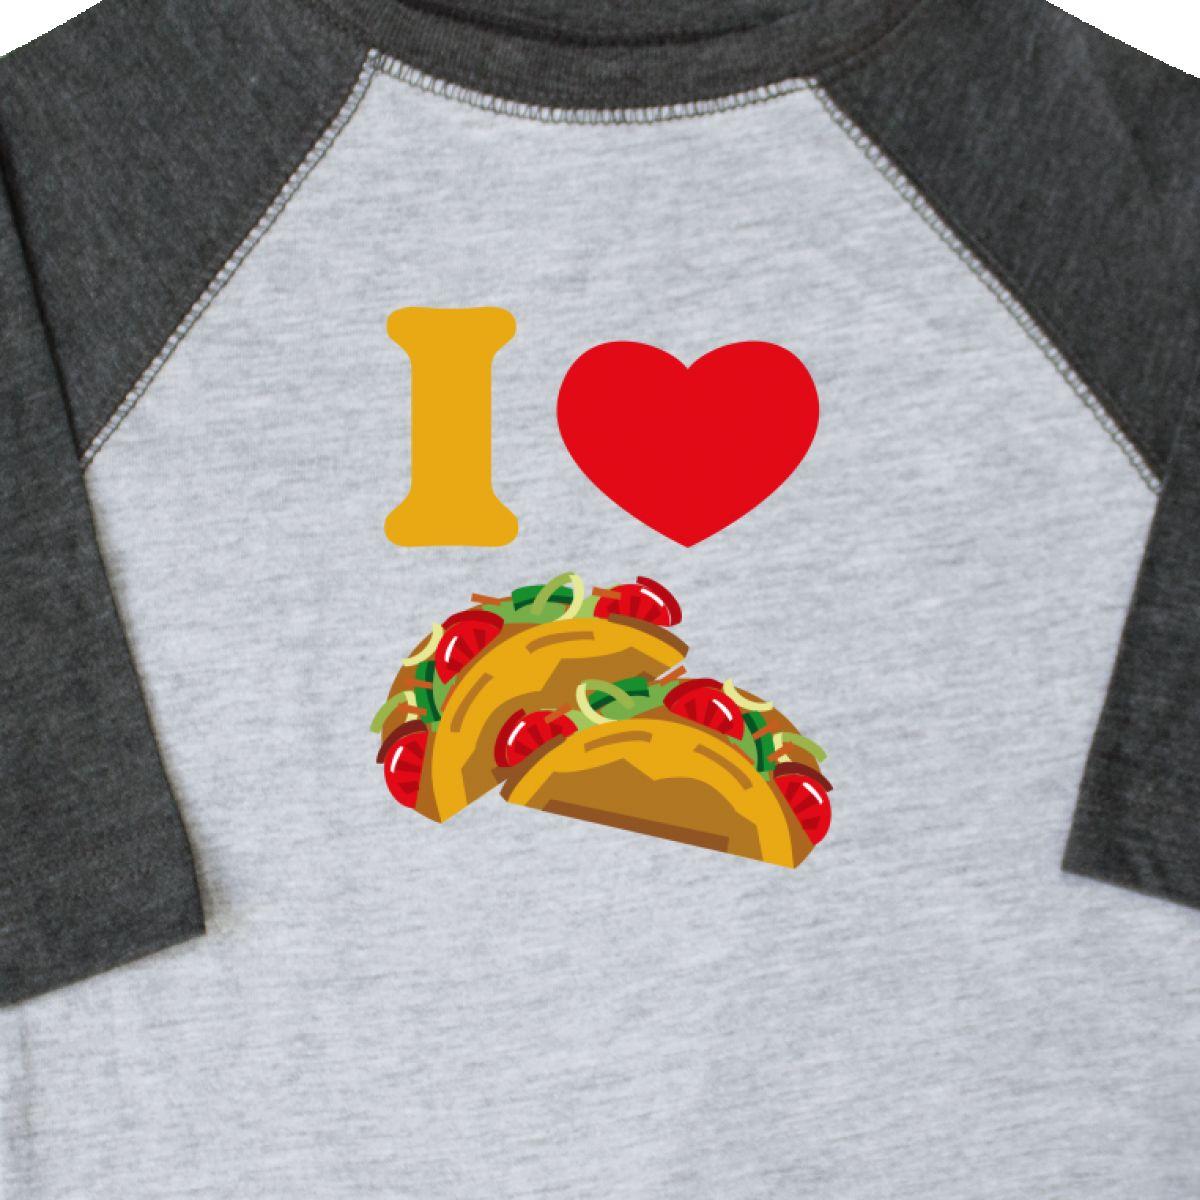 524d8b3f Inktastic I Love Tacos Toddler T-Shirt Heart Taco Mexican Food ...